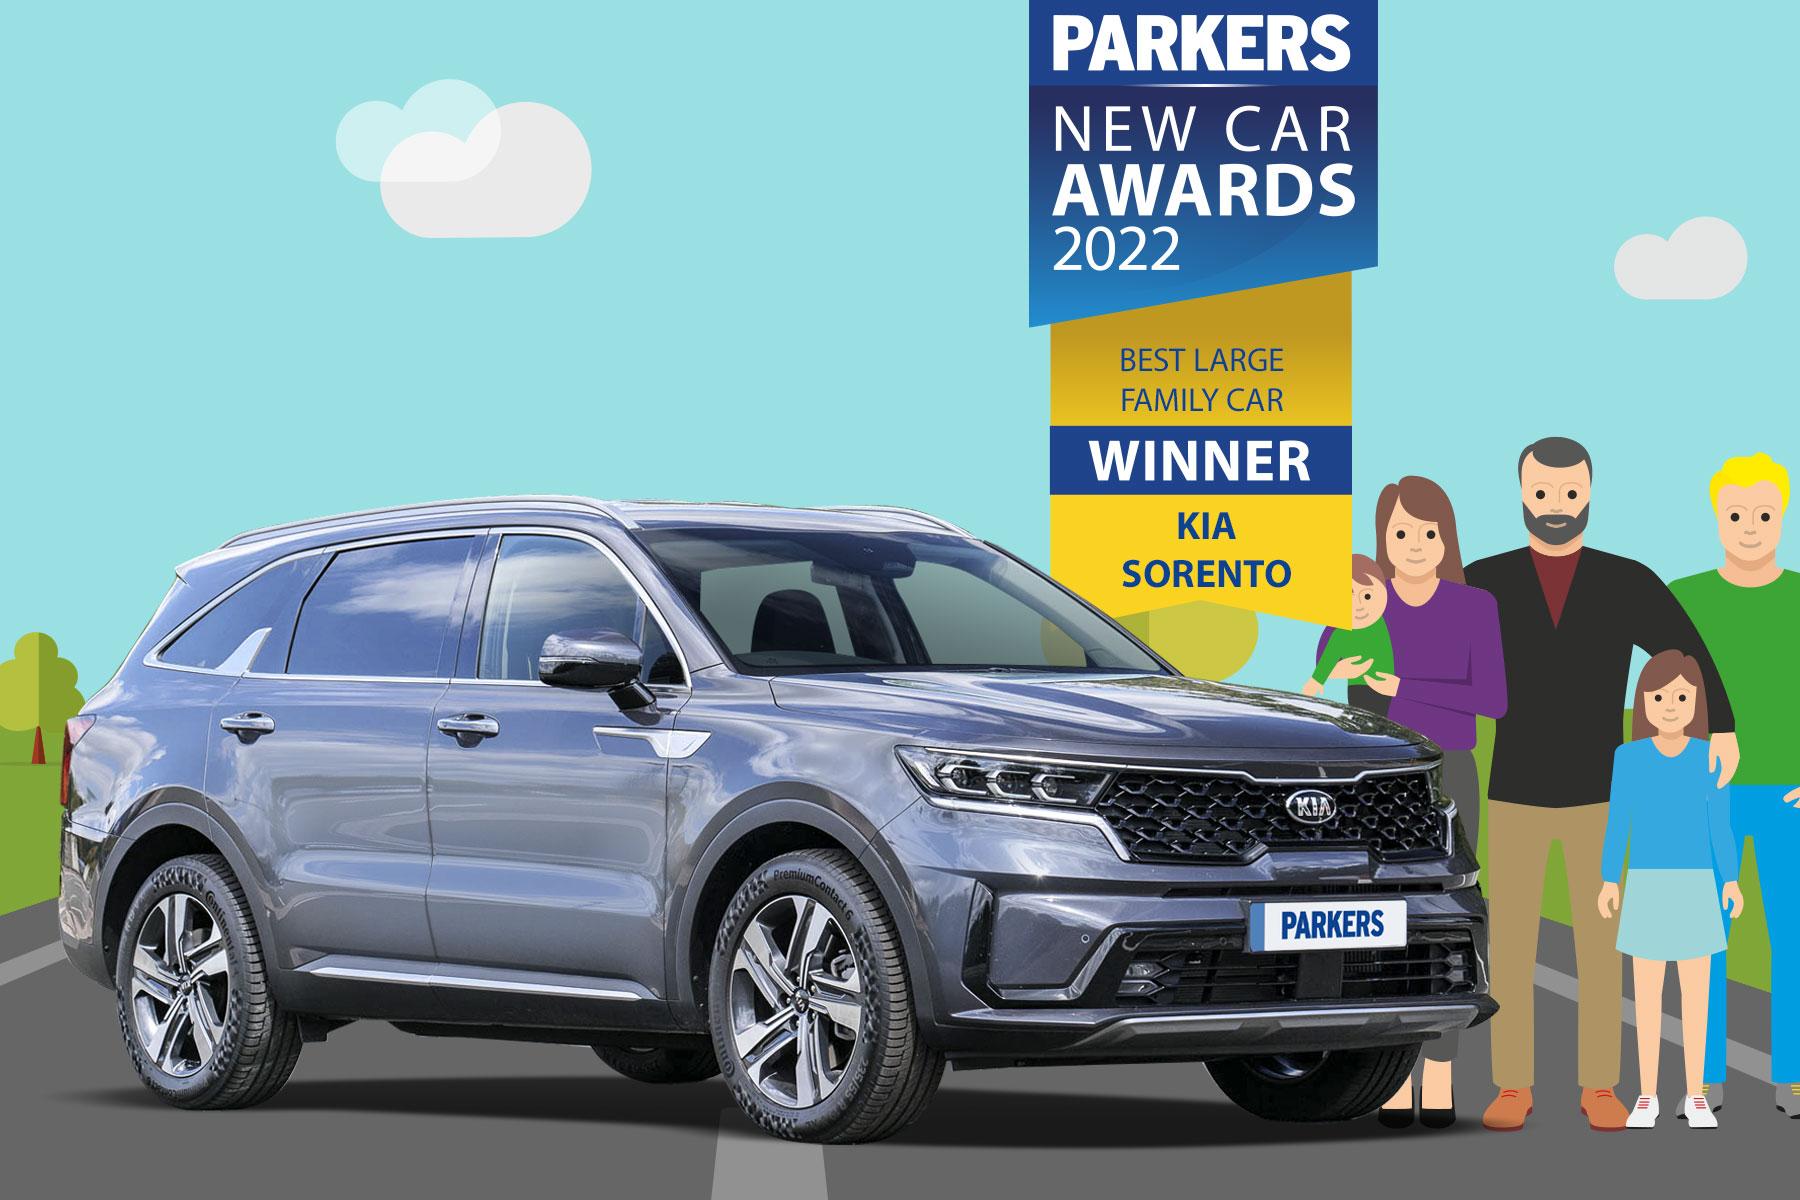 SORENTO WINS 'BEST LARGE FAMILY CAR'